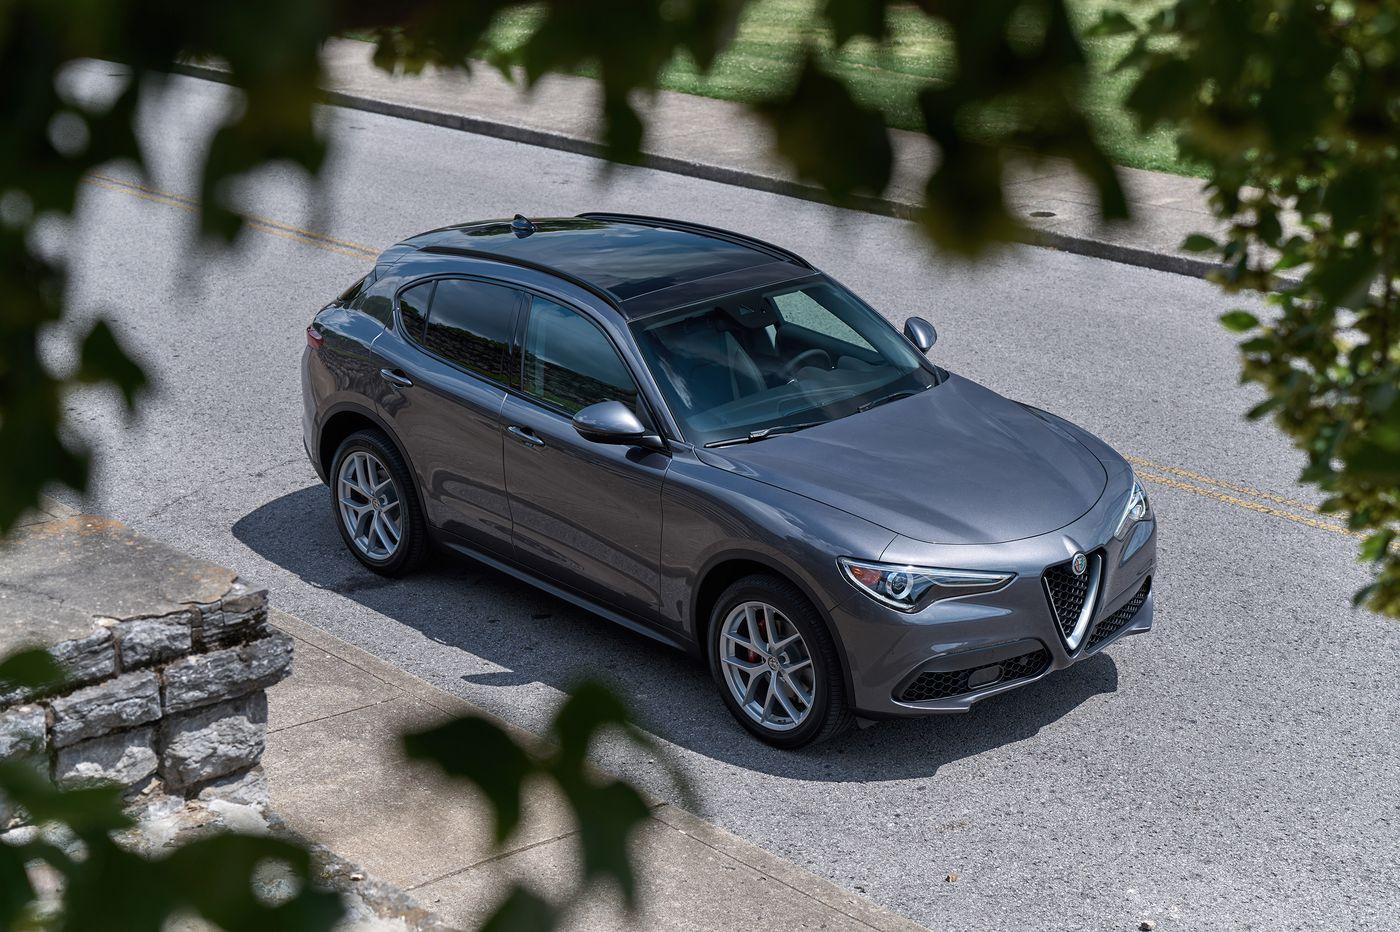 2018 Stelvio rounds out the Alfa Romeo lineup